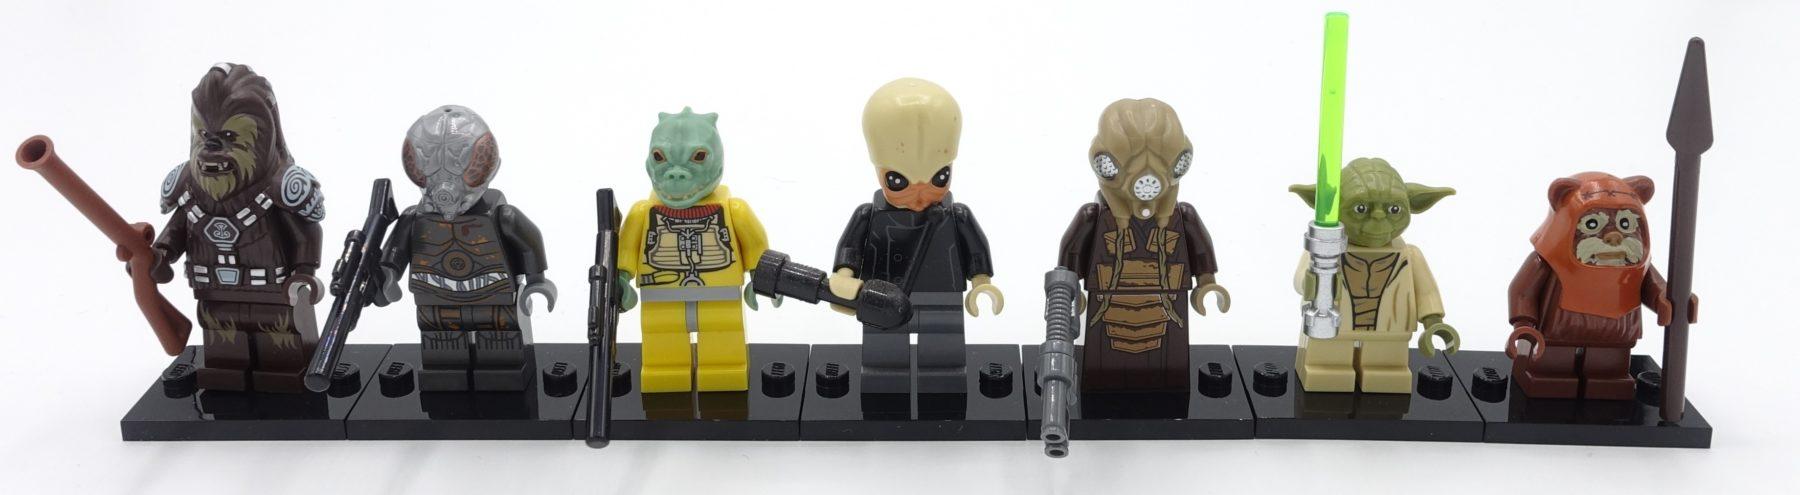 Verschiedene Köpfe bei LEGO Star Wars Minifiguren